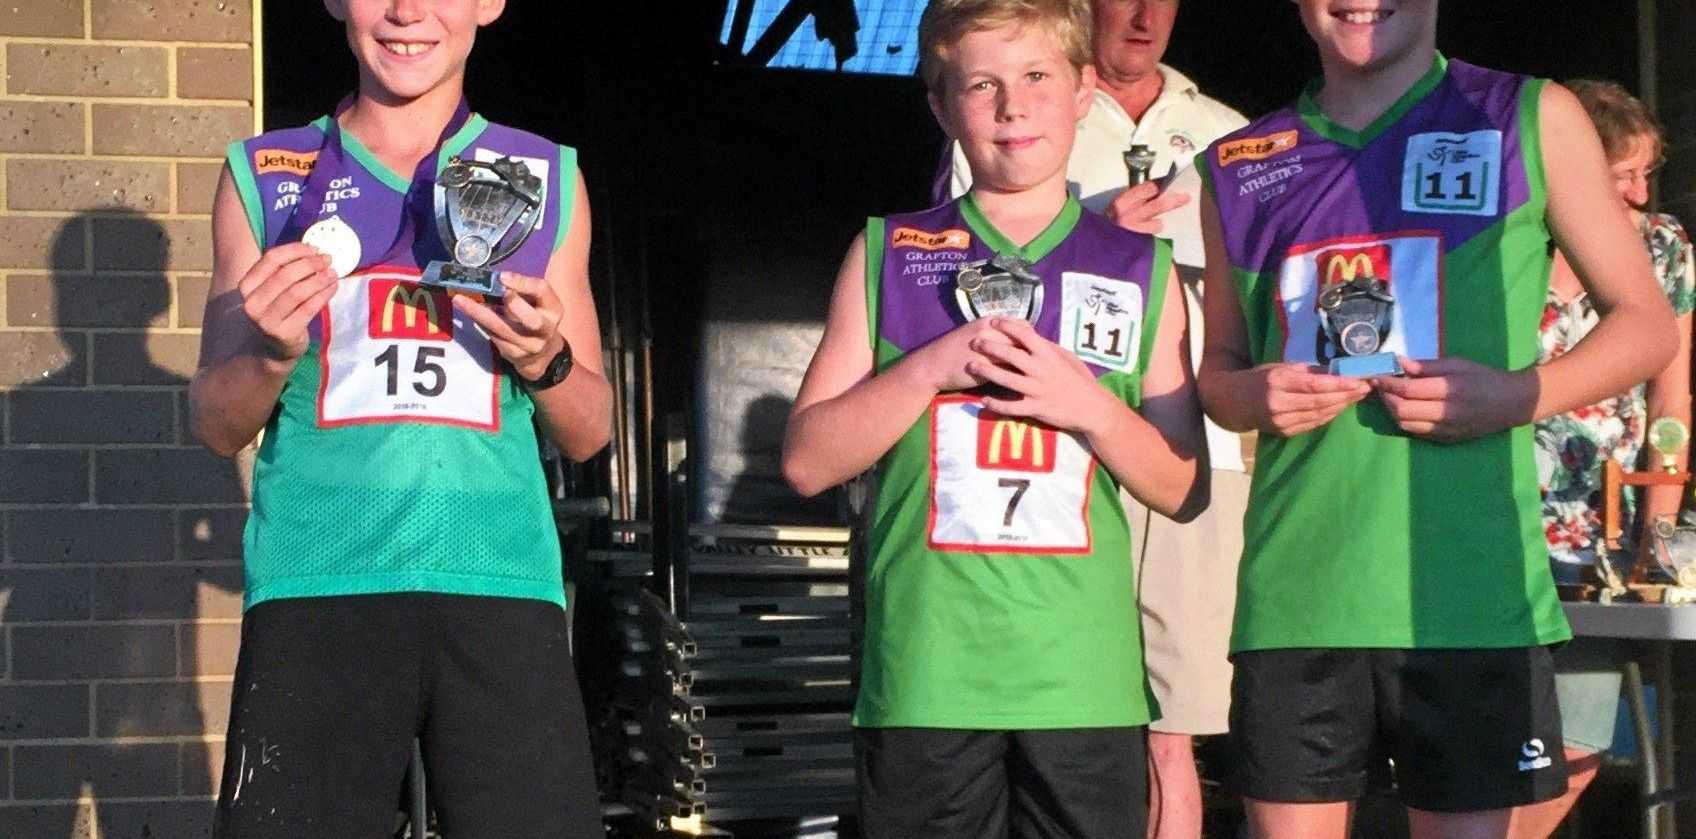 U11 Boys point score and age champion recipients